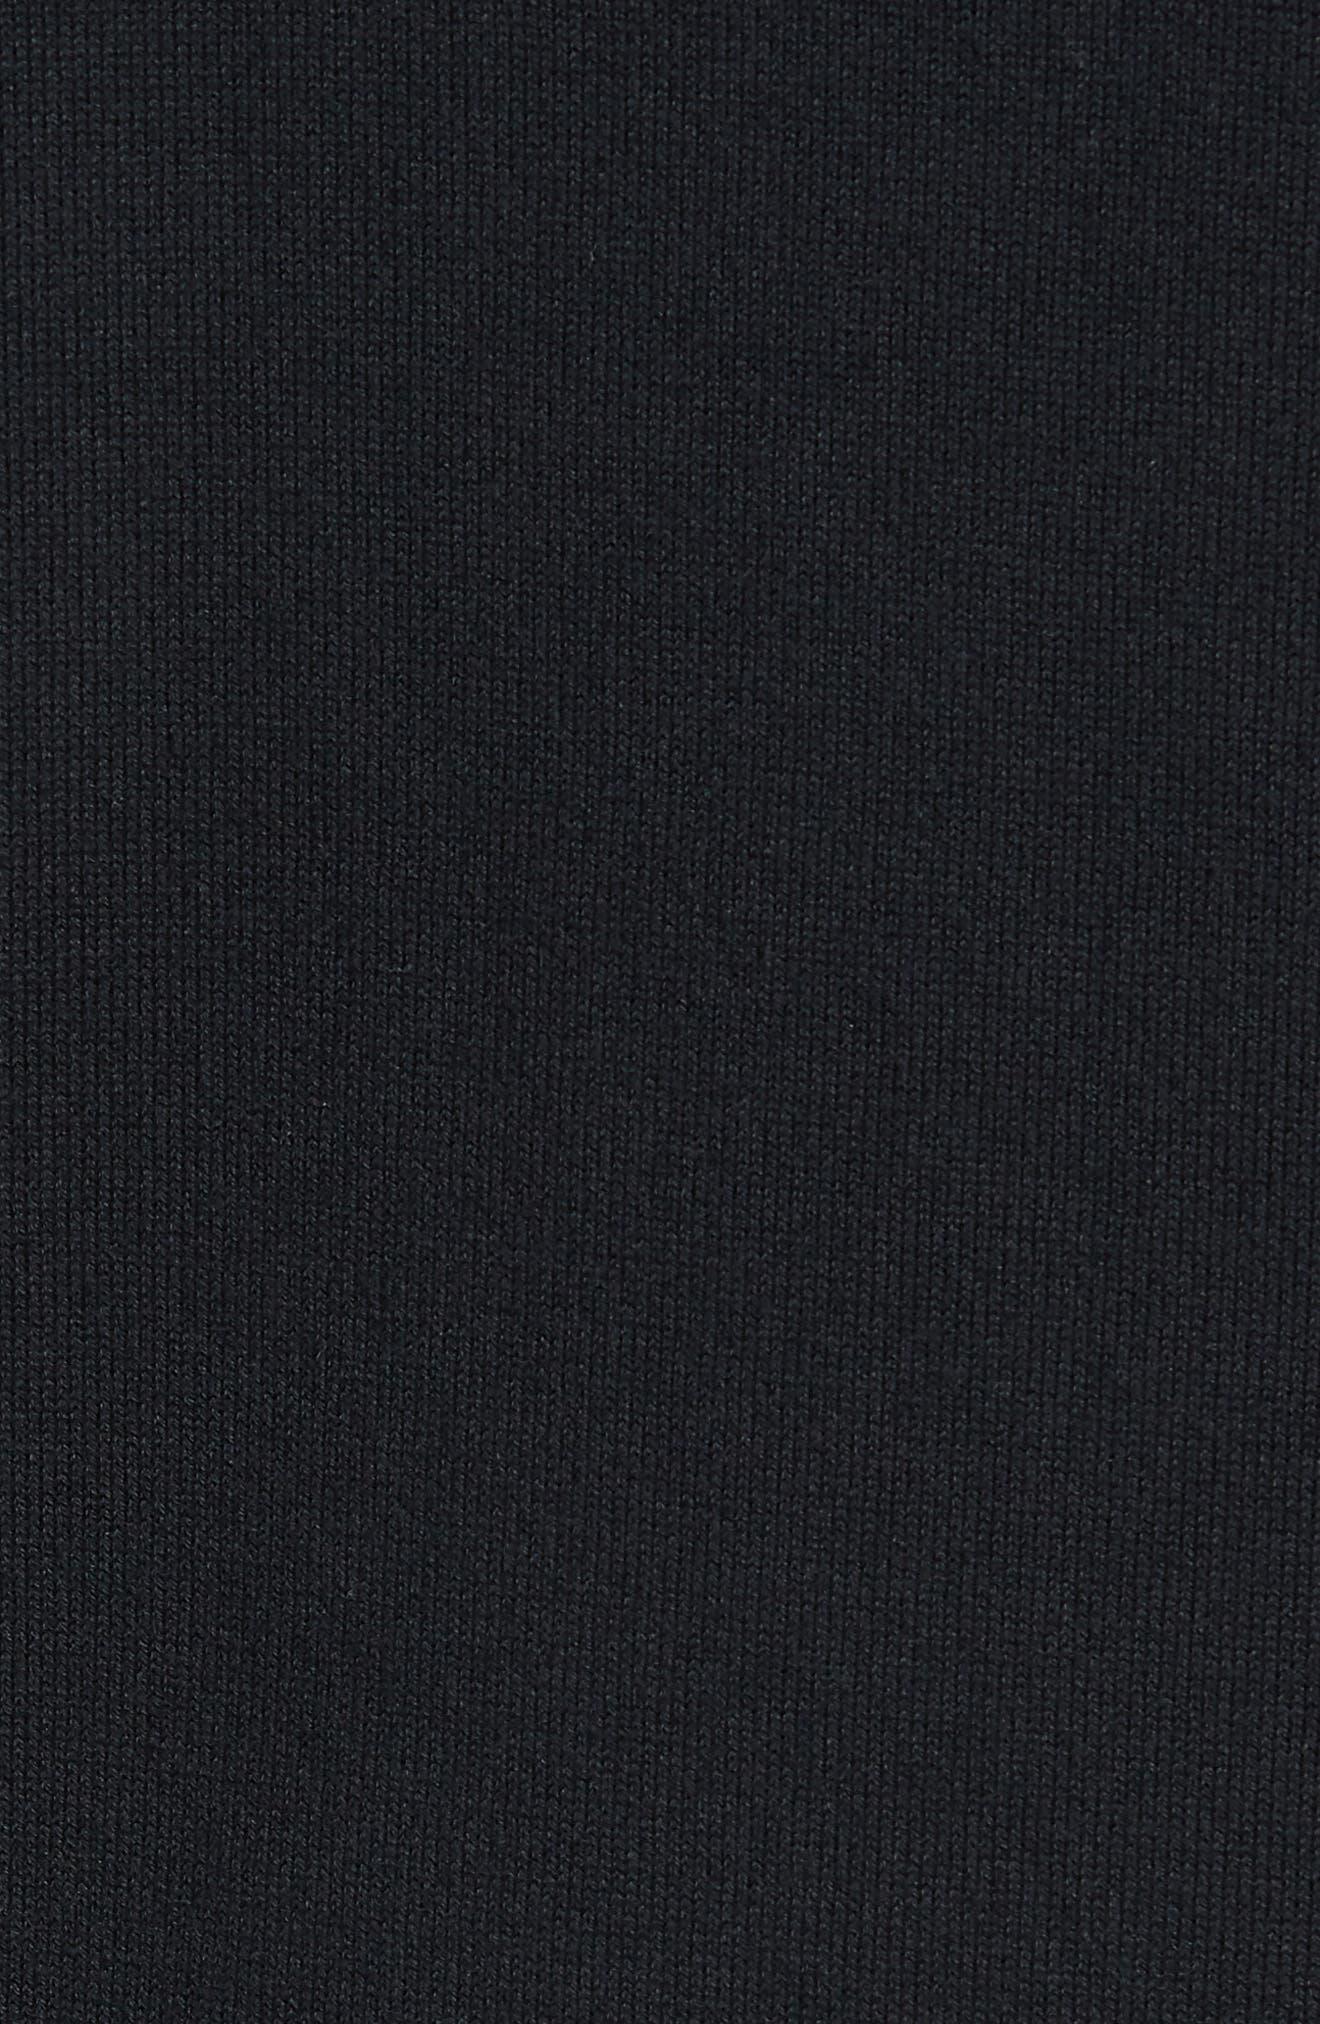 Cleveland Browns - Lakemont Regular Fit Quarter Zip Sweater,                             Alternate thumbnail 5, color,                             BLACK